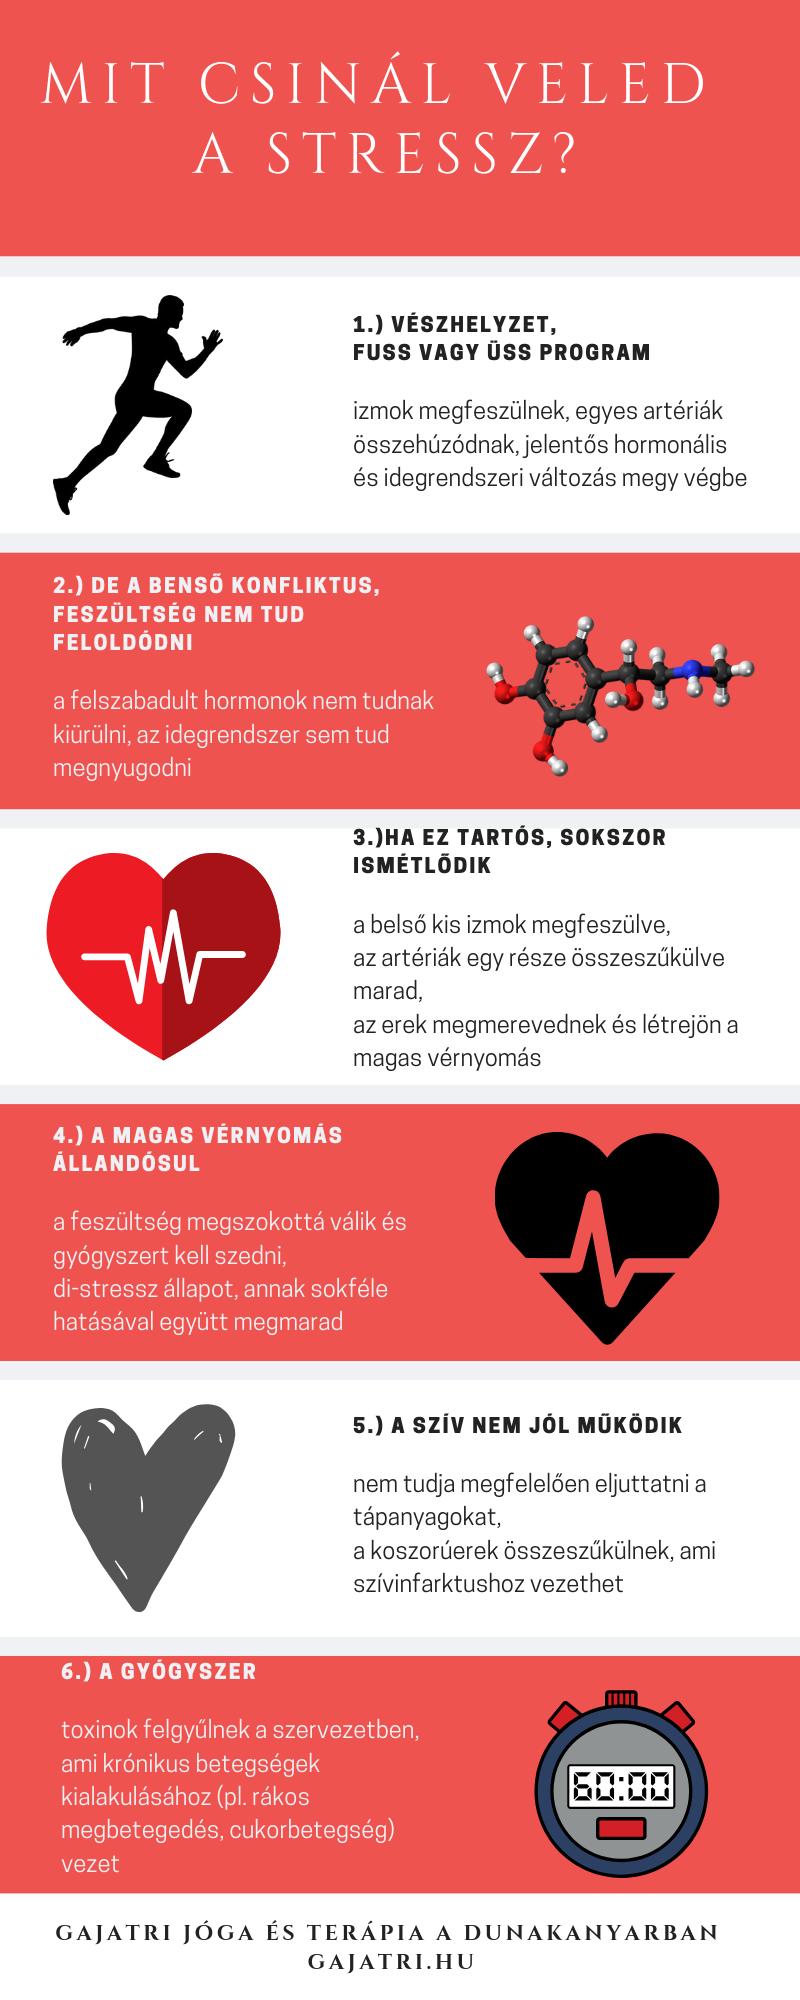 a magas vérnyomás meggyógyul)